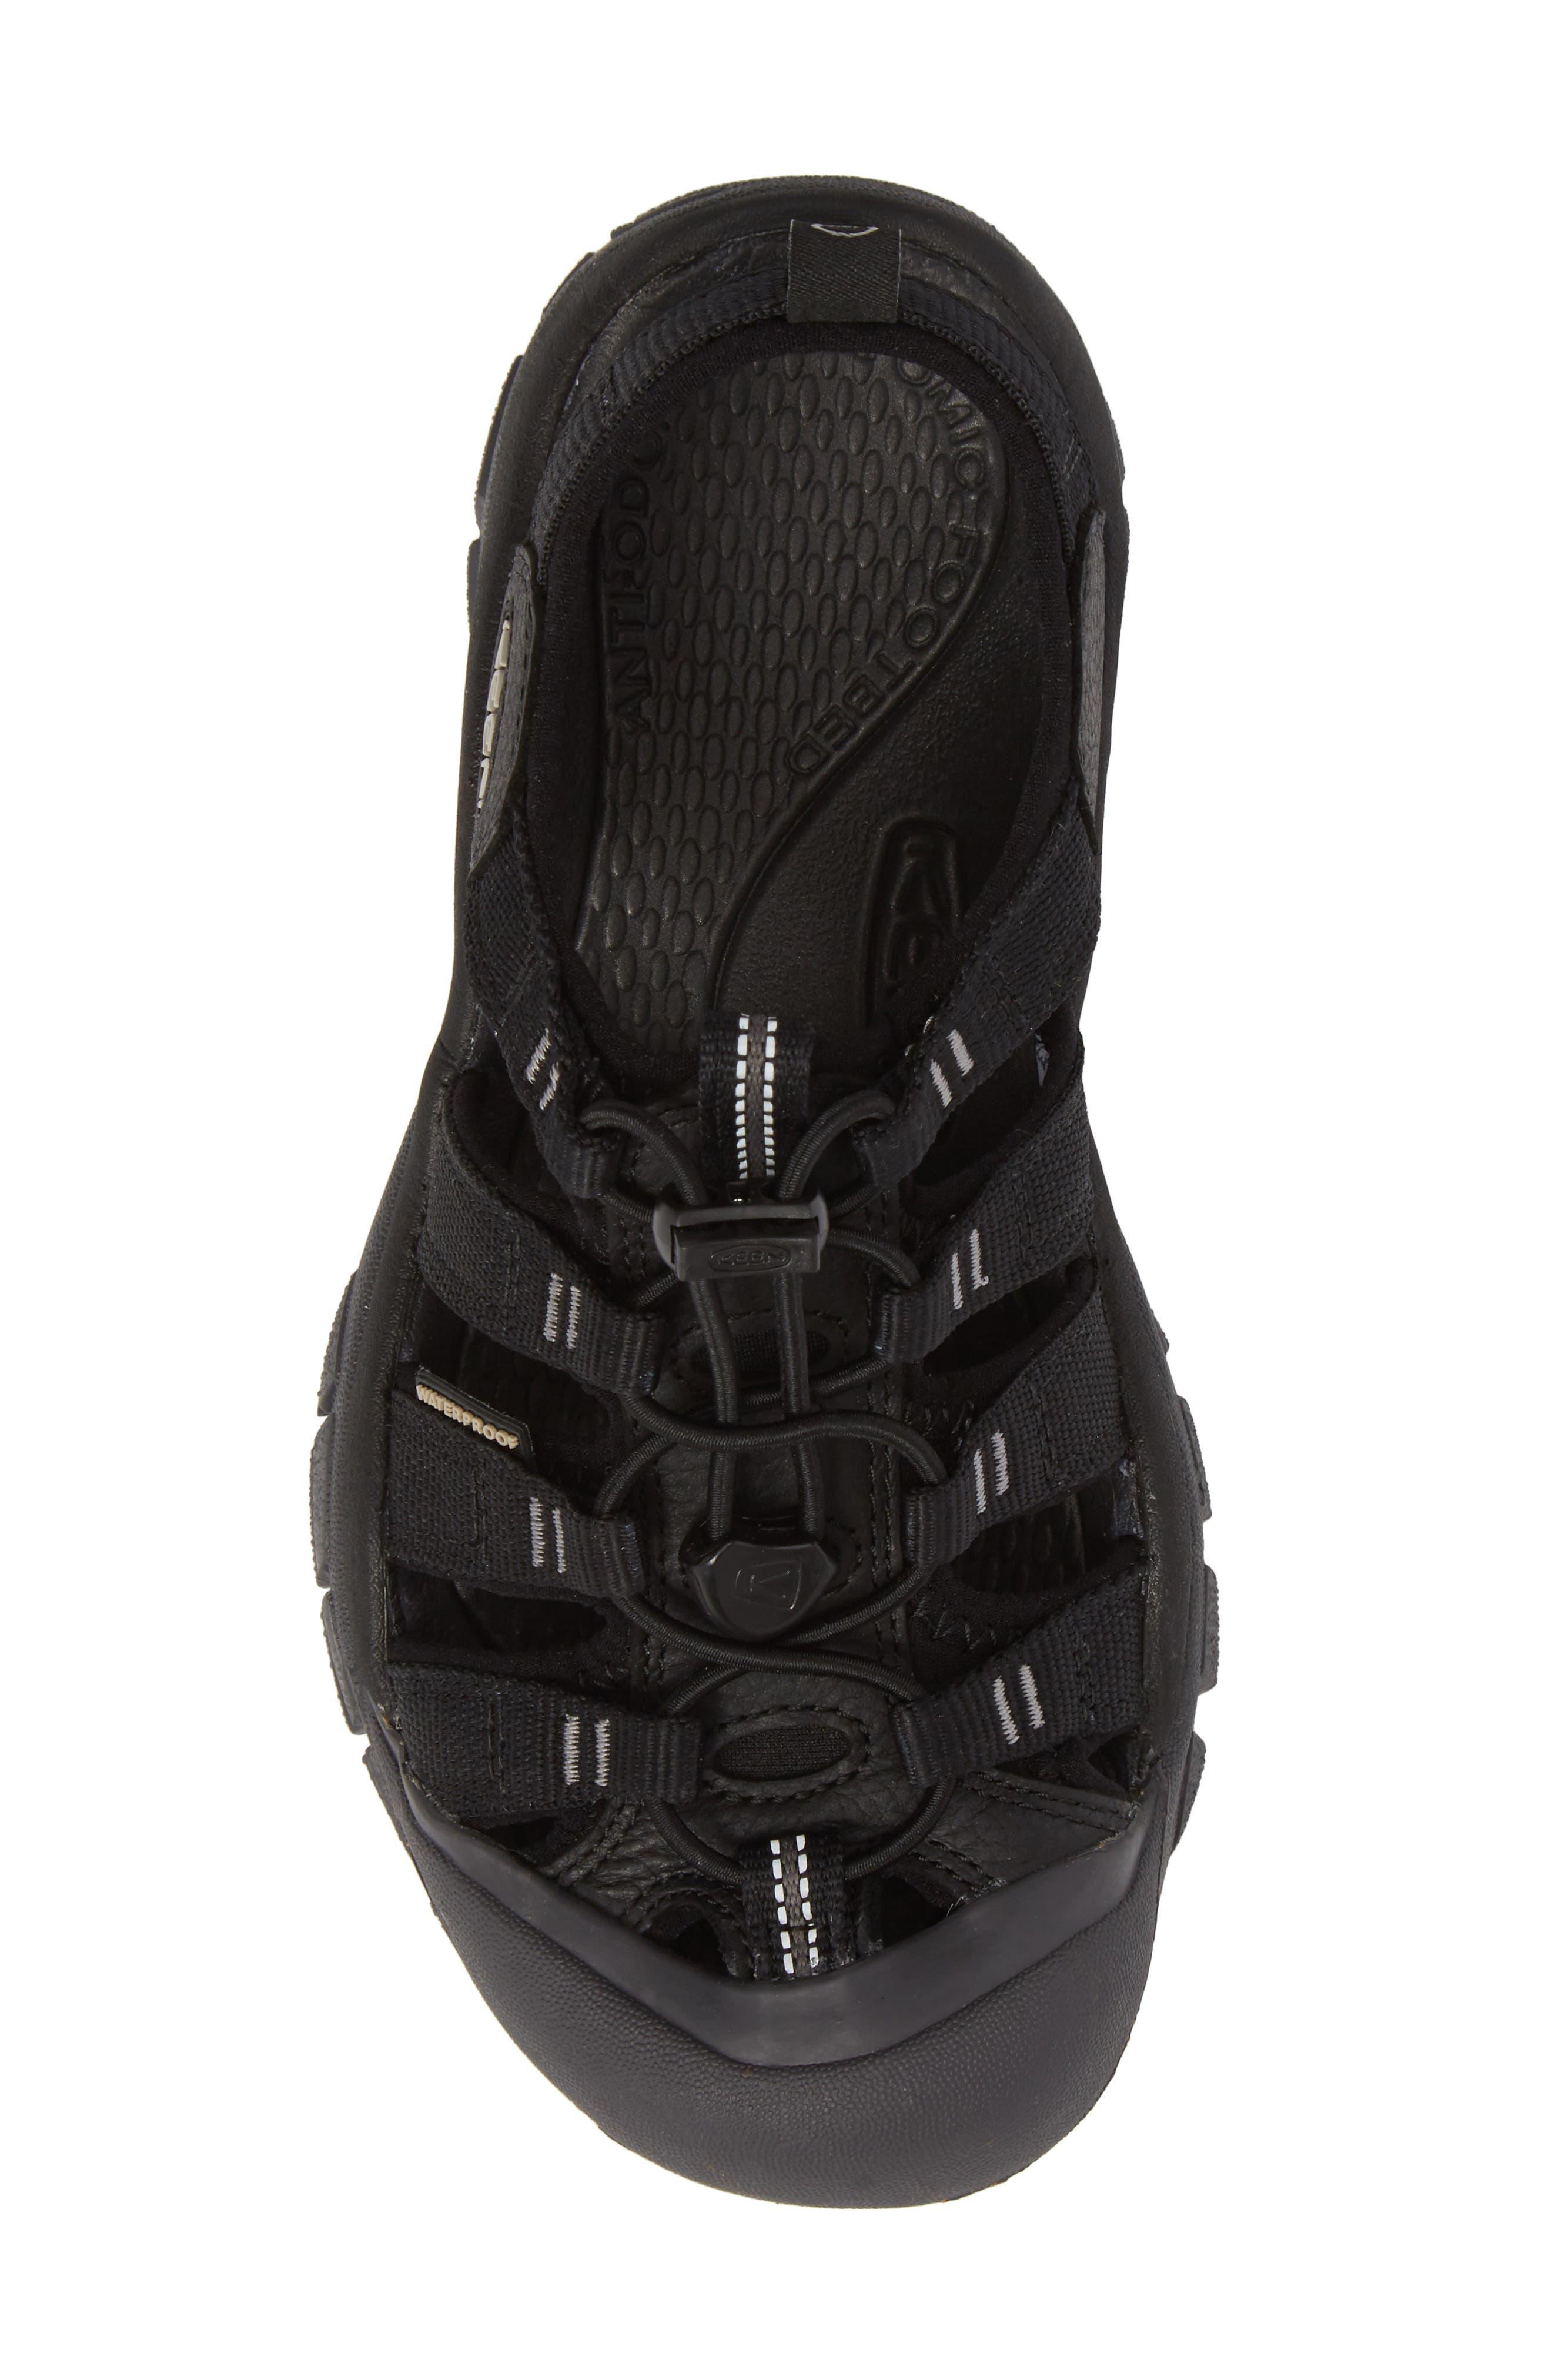 Newport Eco Waterproof Sandal,                             Alternate thumbnail 5, color,                             Black/ Magnet